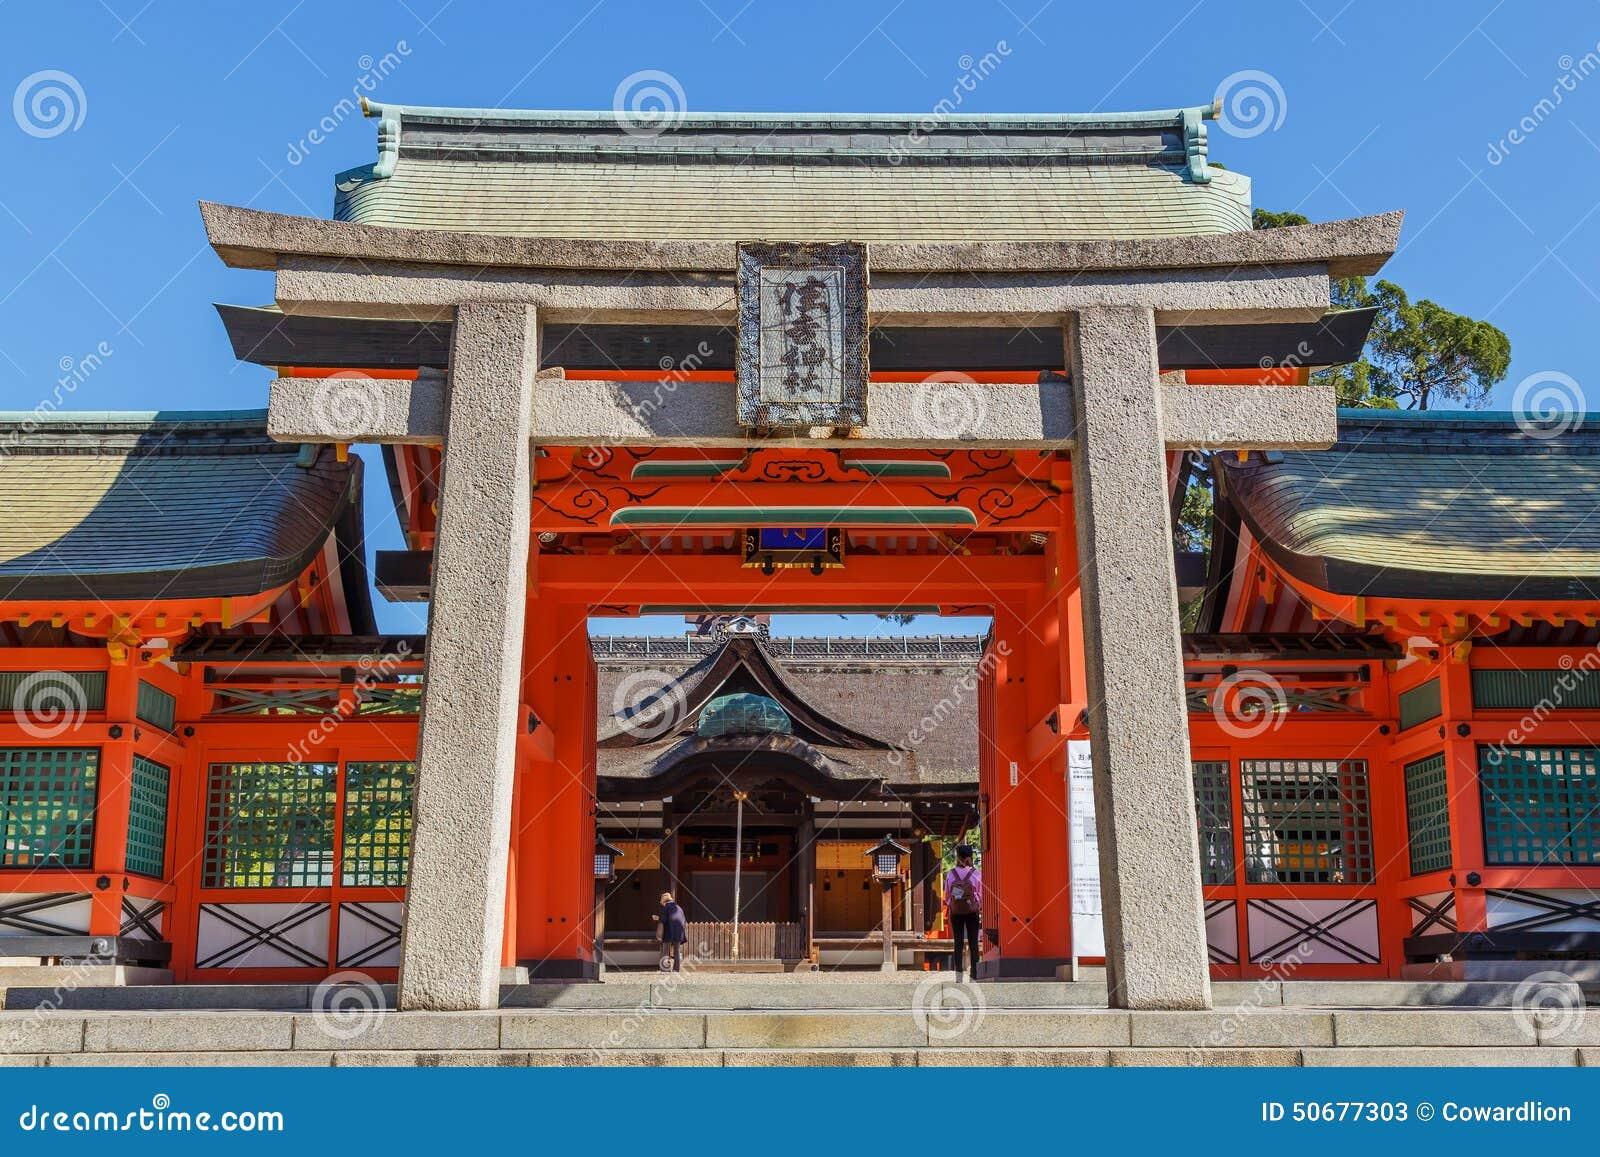 Download Sumiyoshi盛大寺庙在大阪 库存图片. 图片 包括有 传统, 全部, 布琼布拉, 橙色, 日语, 大阪 - 50677303